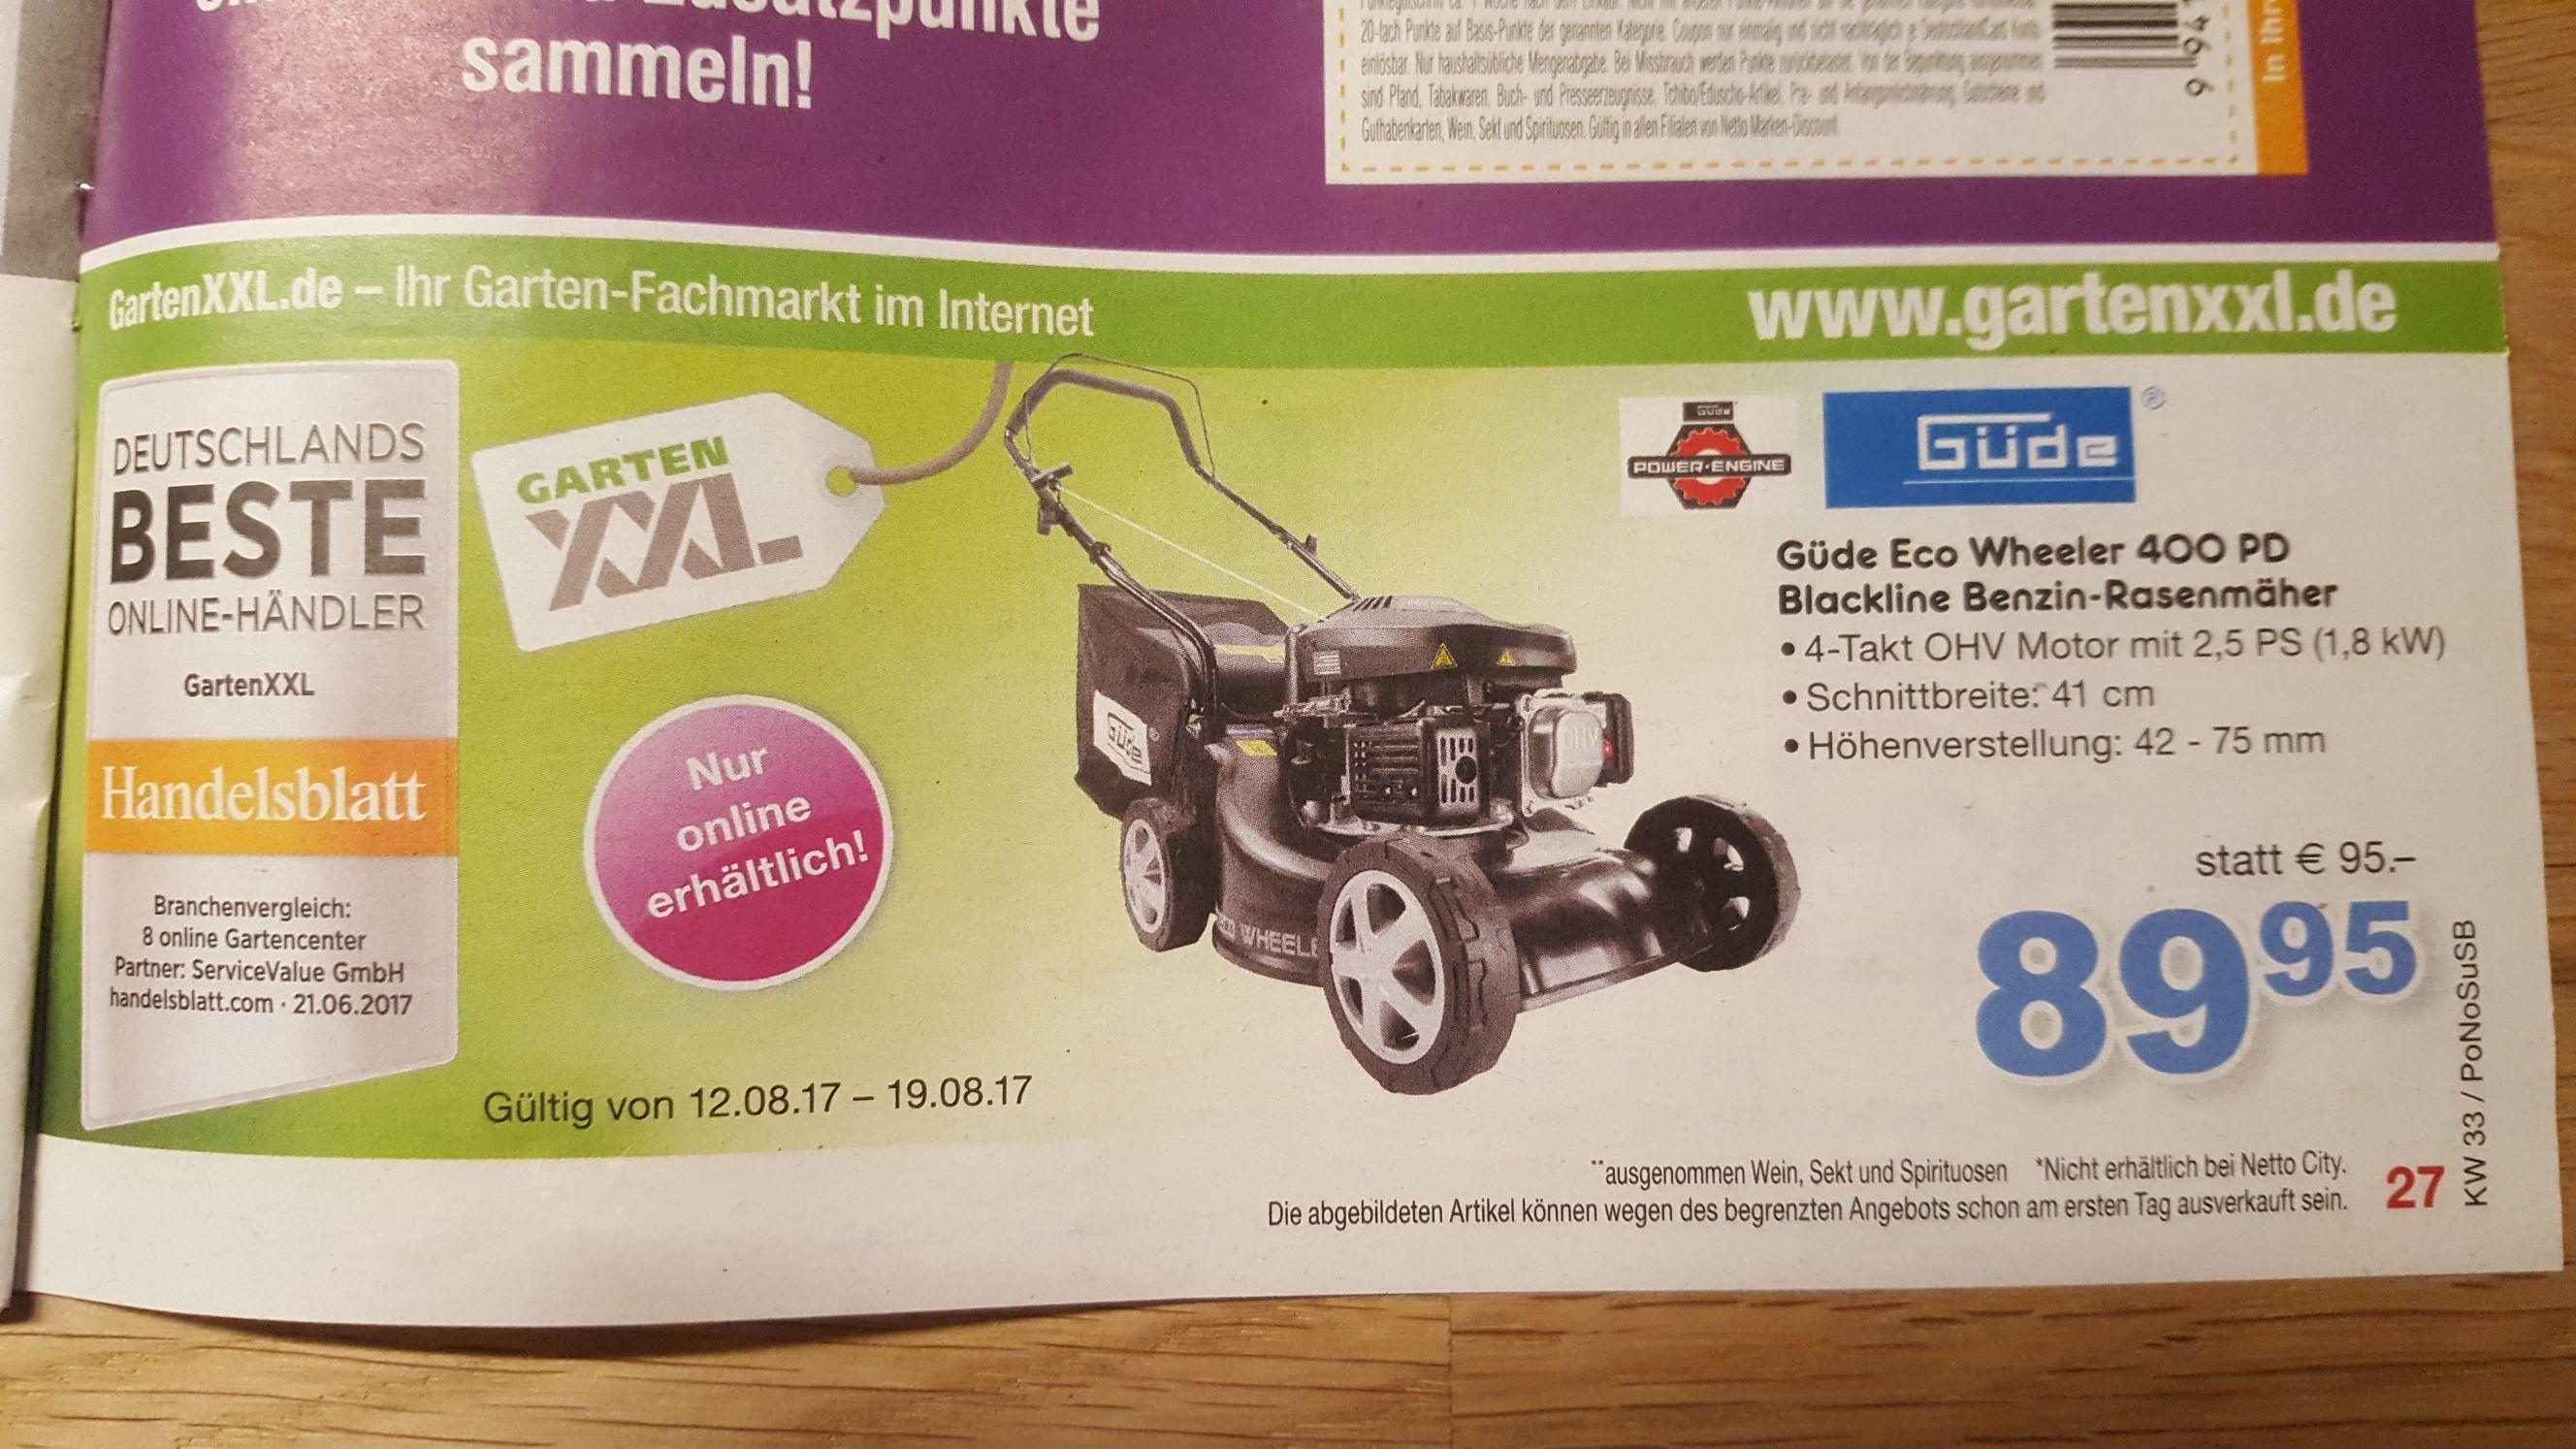 Ab 12.08.17 bis 19.08.17 Güde Eco Wheeler 400 PD Benzin-Rasenmäher bei GartenXXL.de für 69.95 Euro